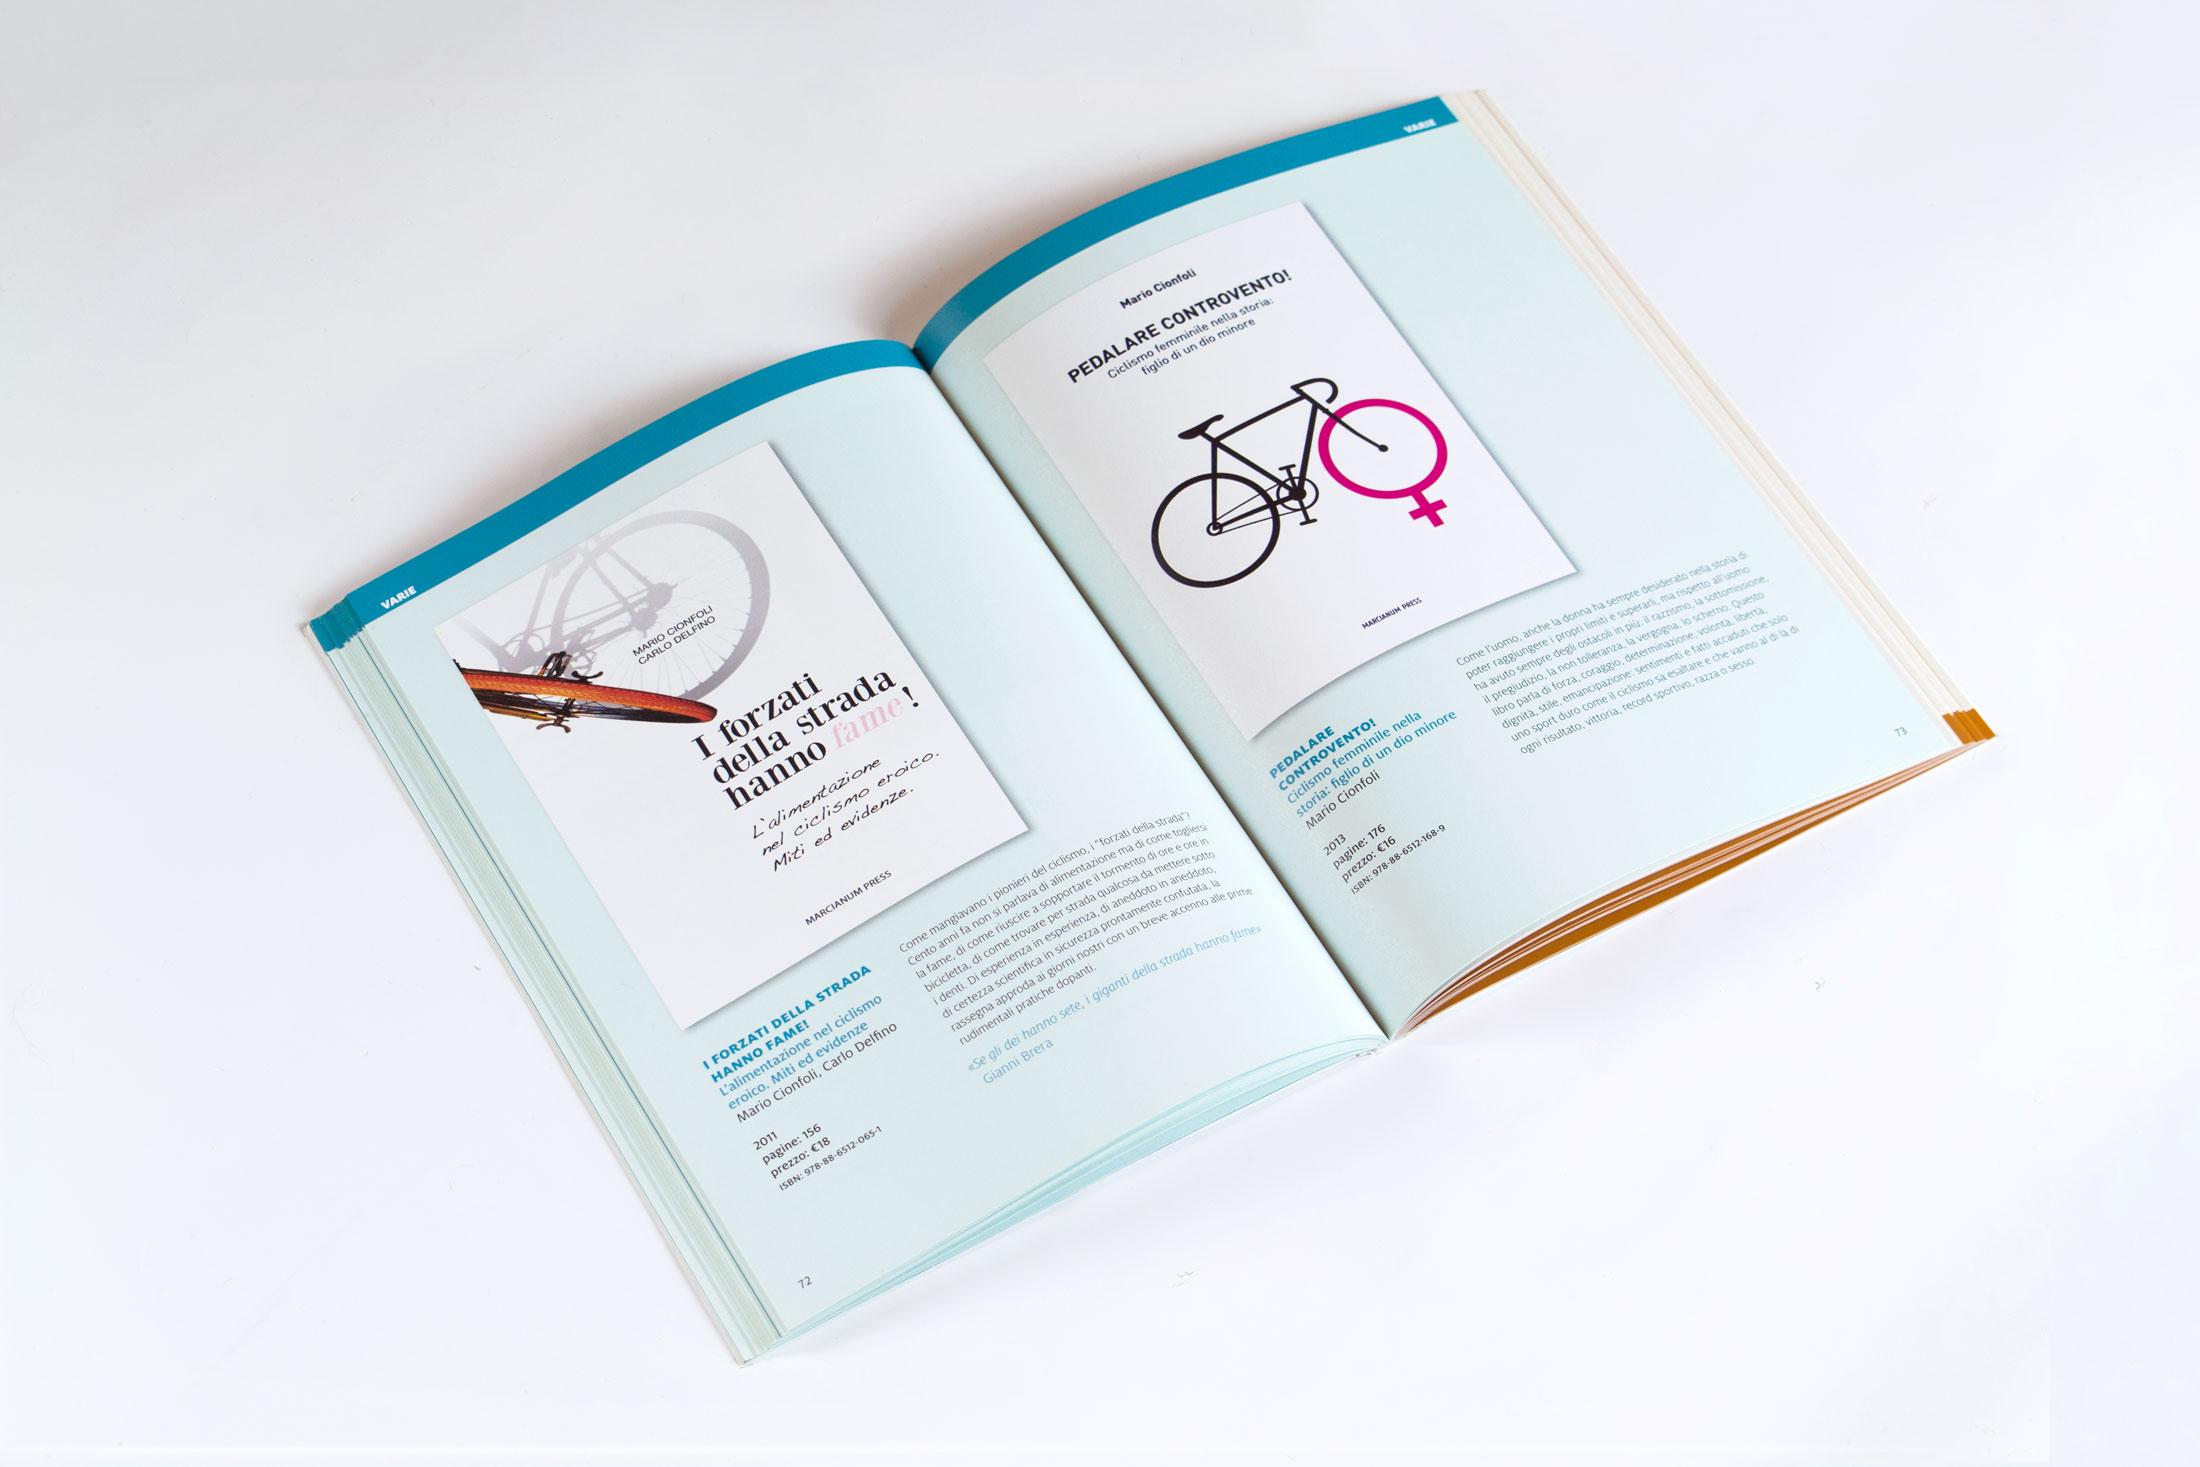 Catalogo Marcianum Press - interno 6